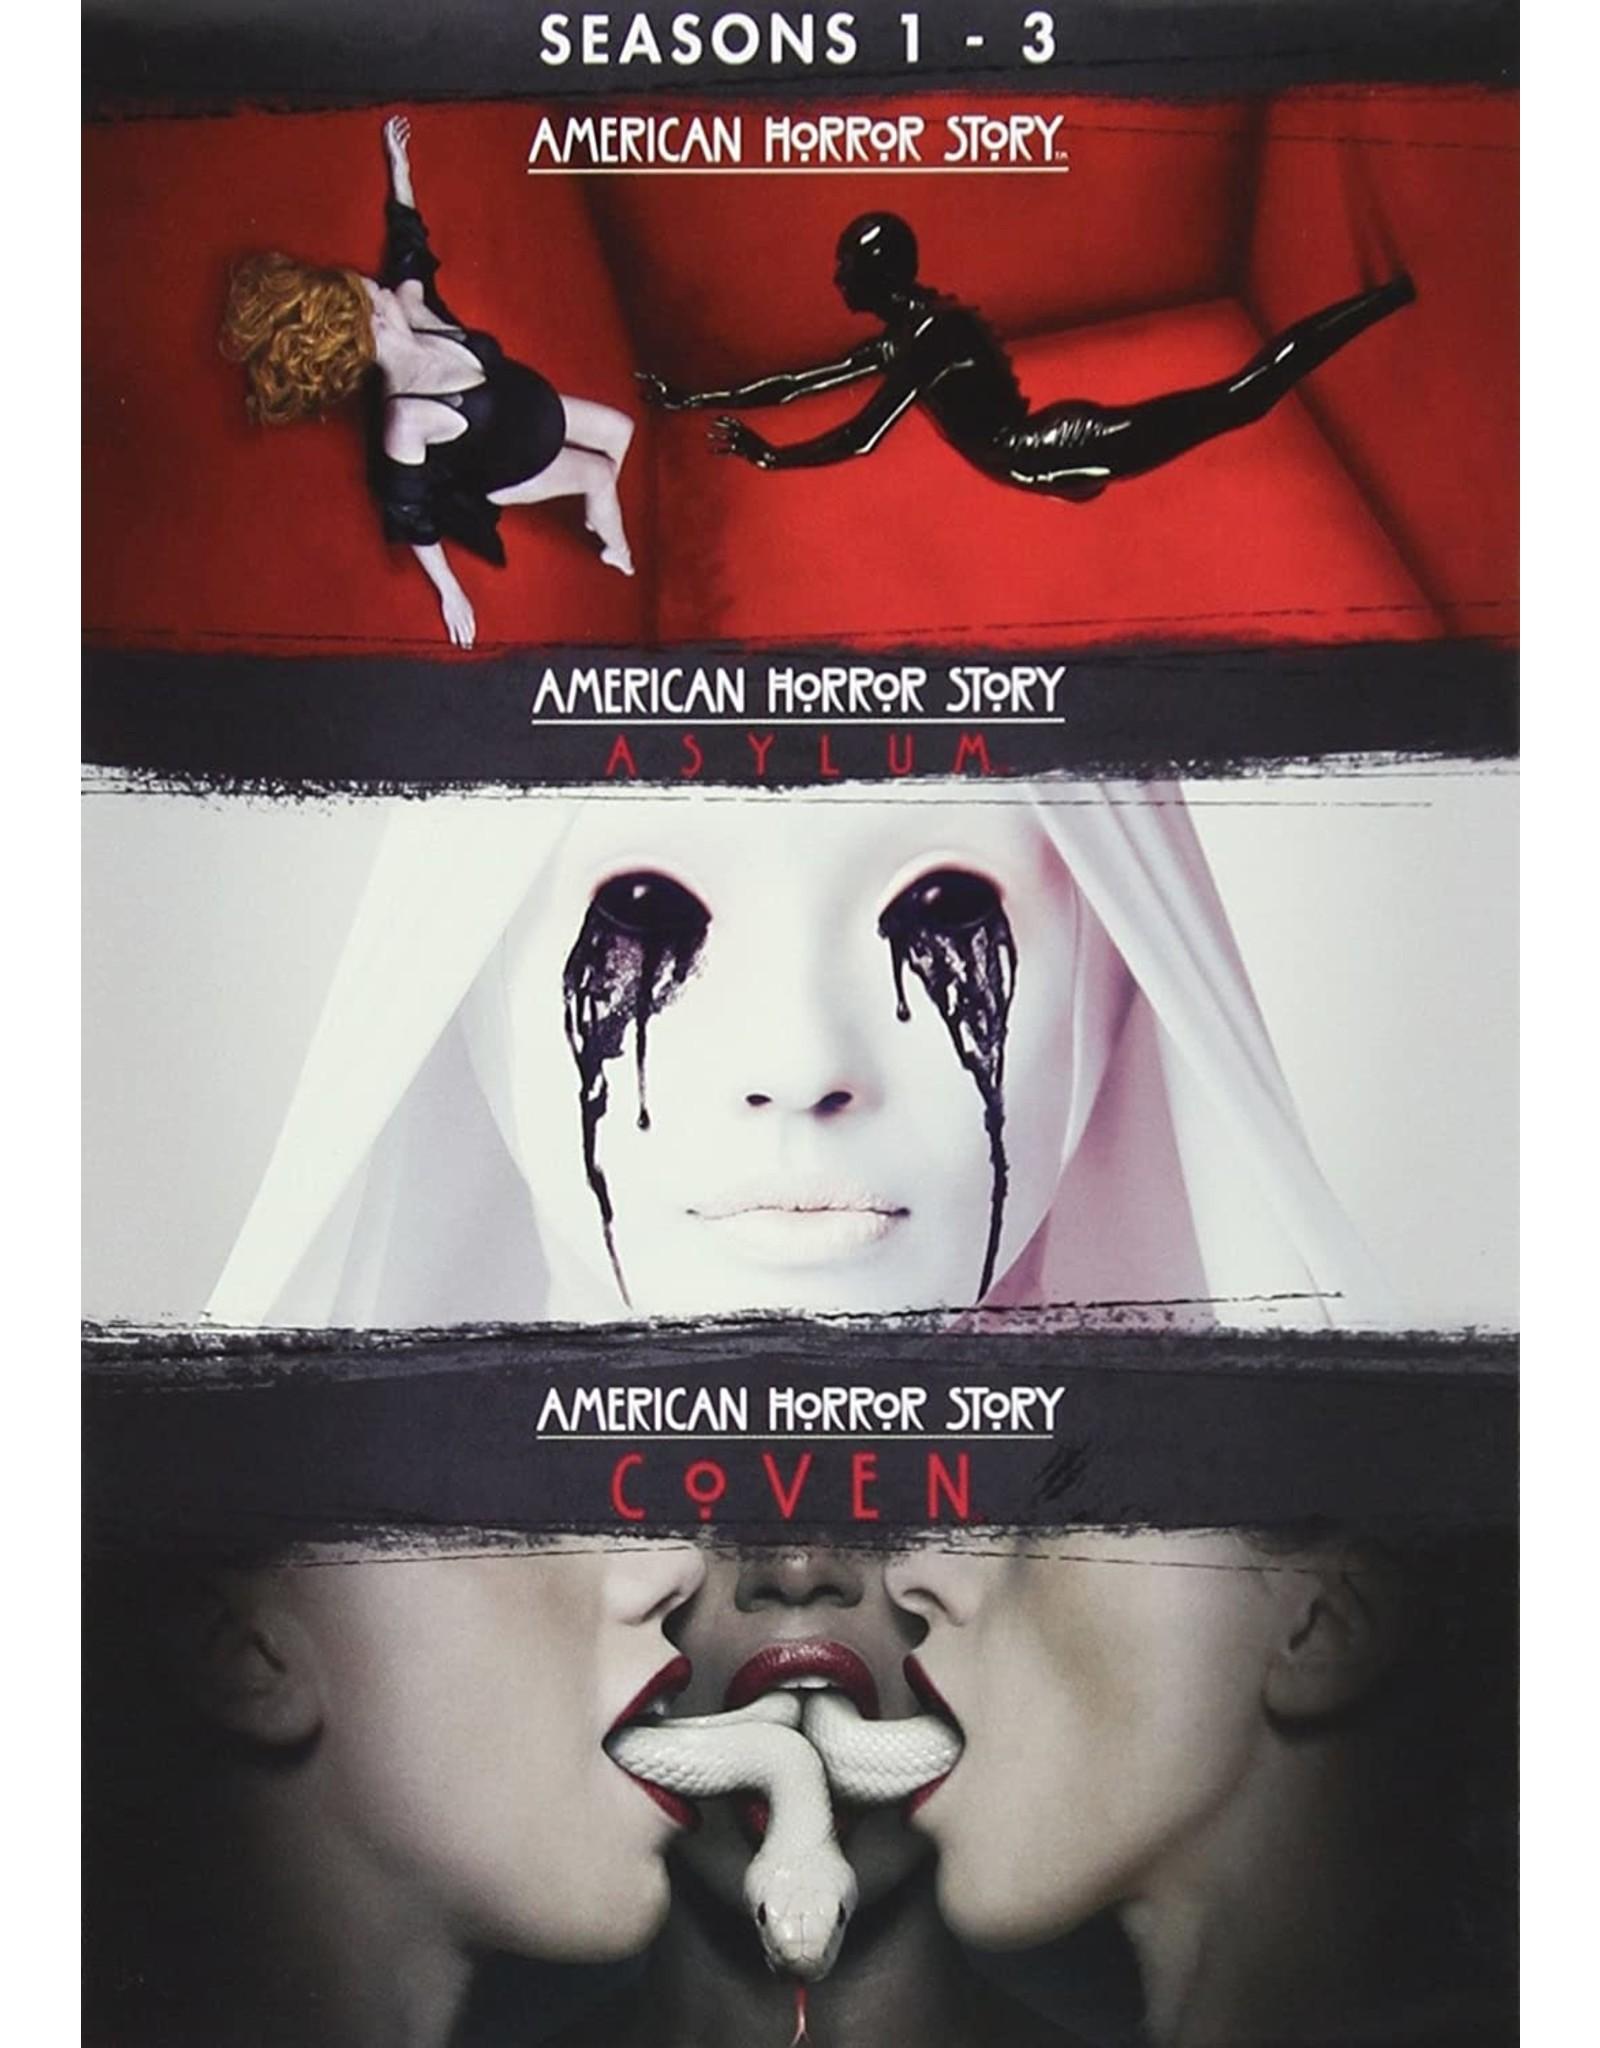 Horror Cult American Horror Story Seasons 1 - 3 (Brand New)